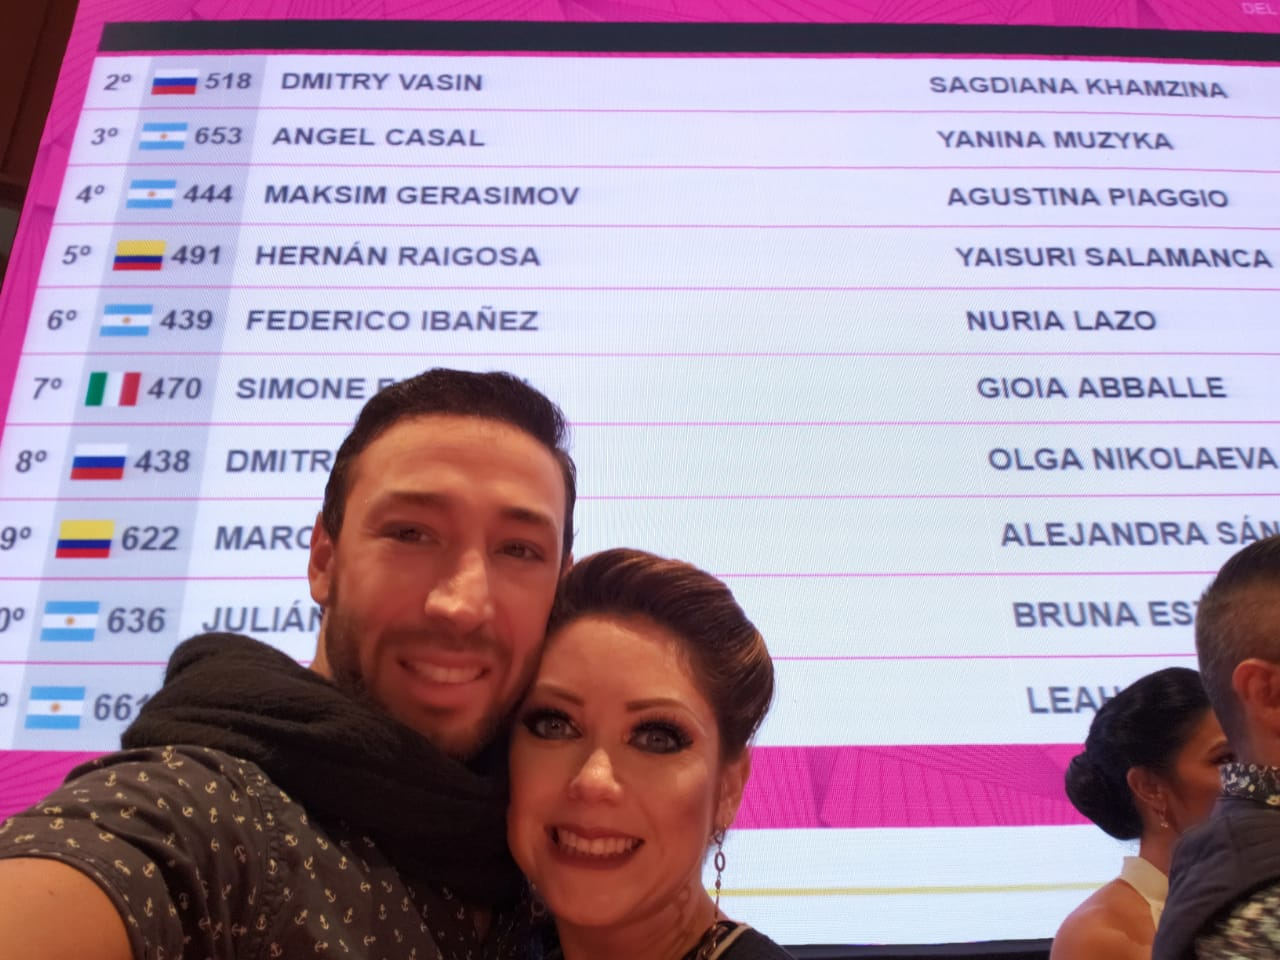 mundial-de-tango-2018-1.jpeg